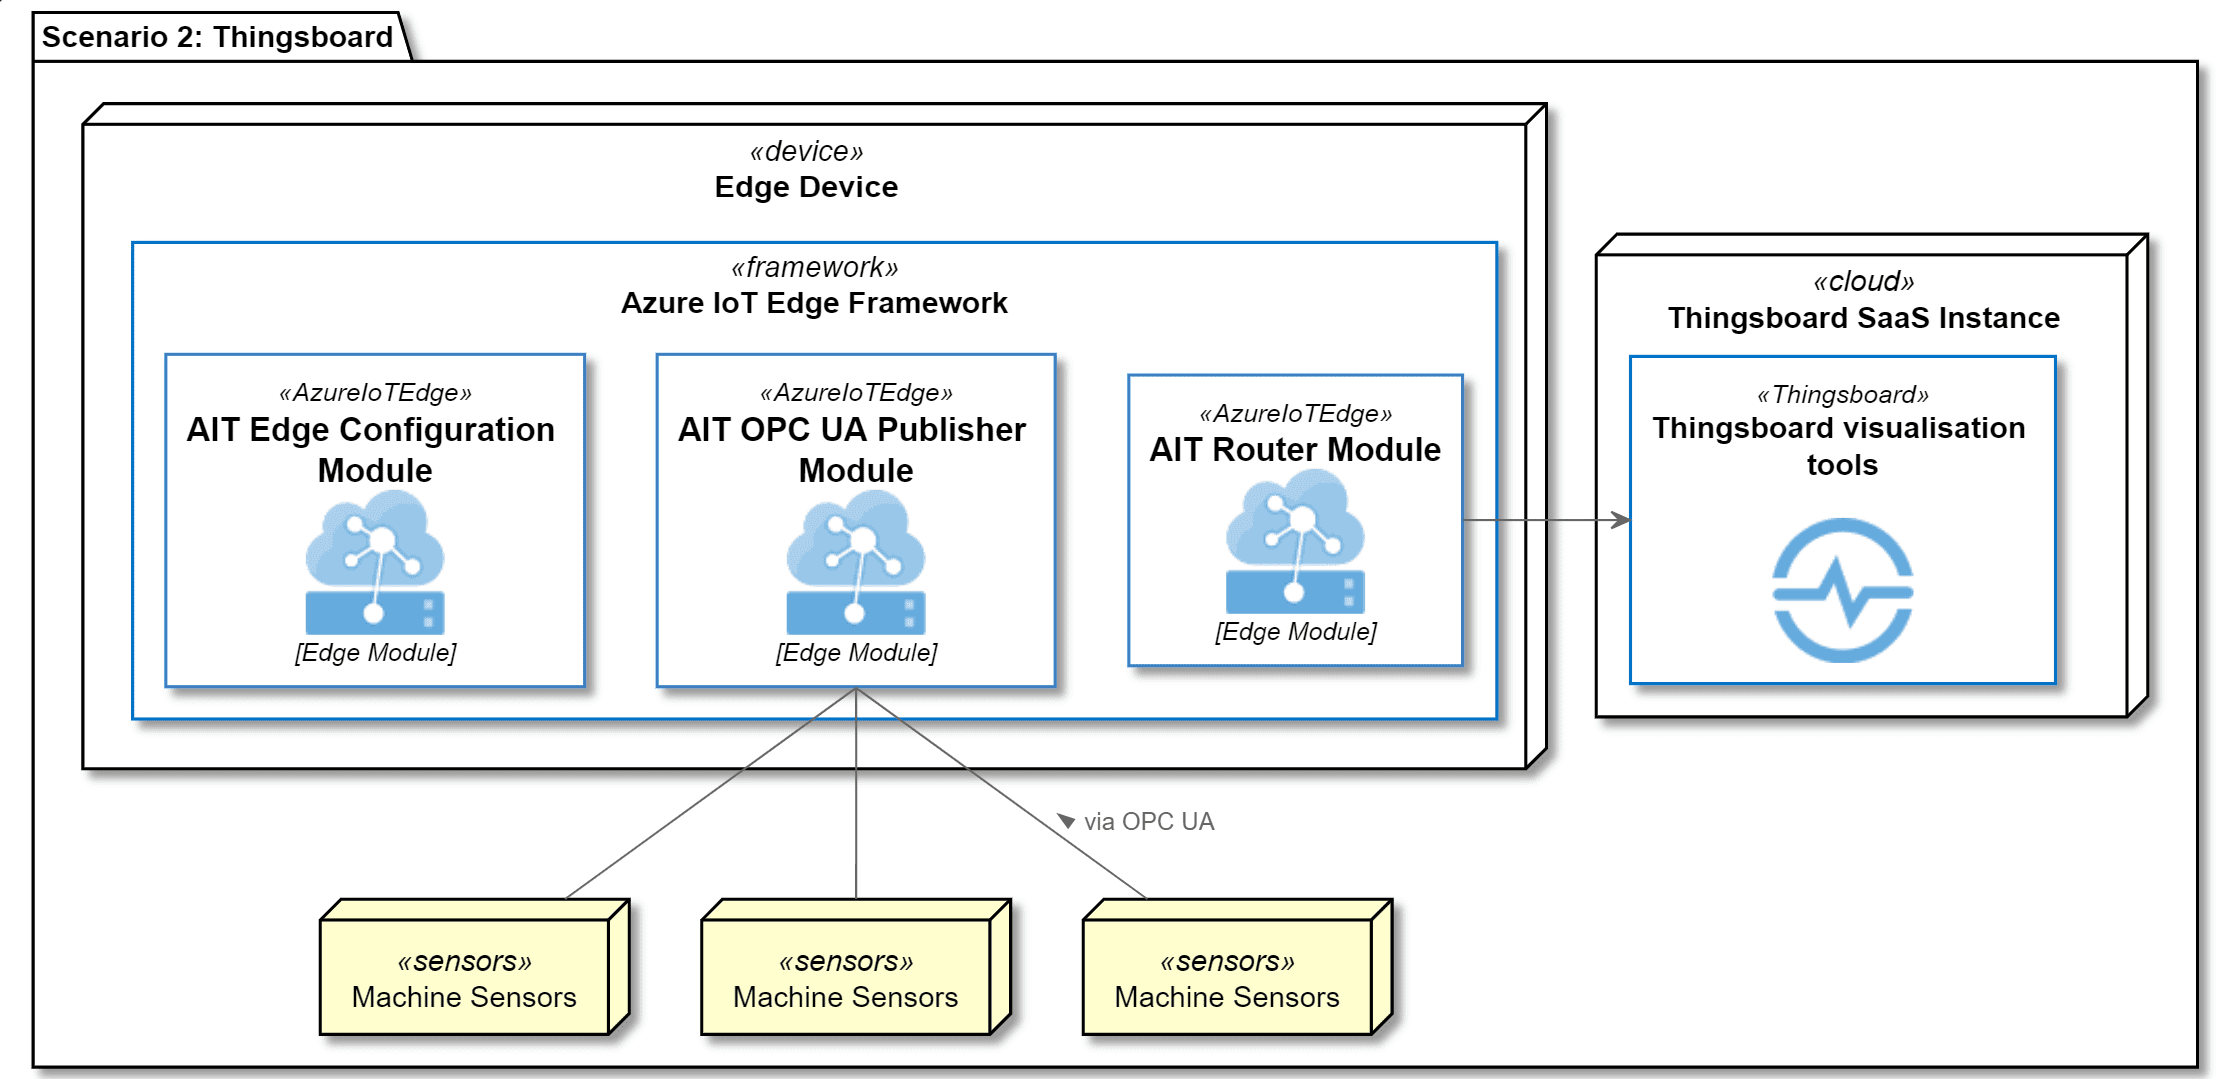 Szenario 2: Thingsboard als Cloudlösung